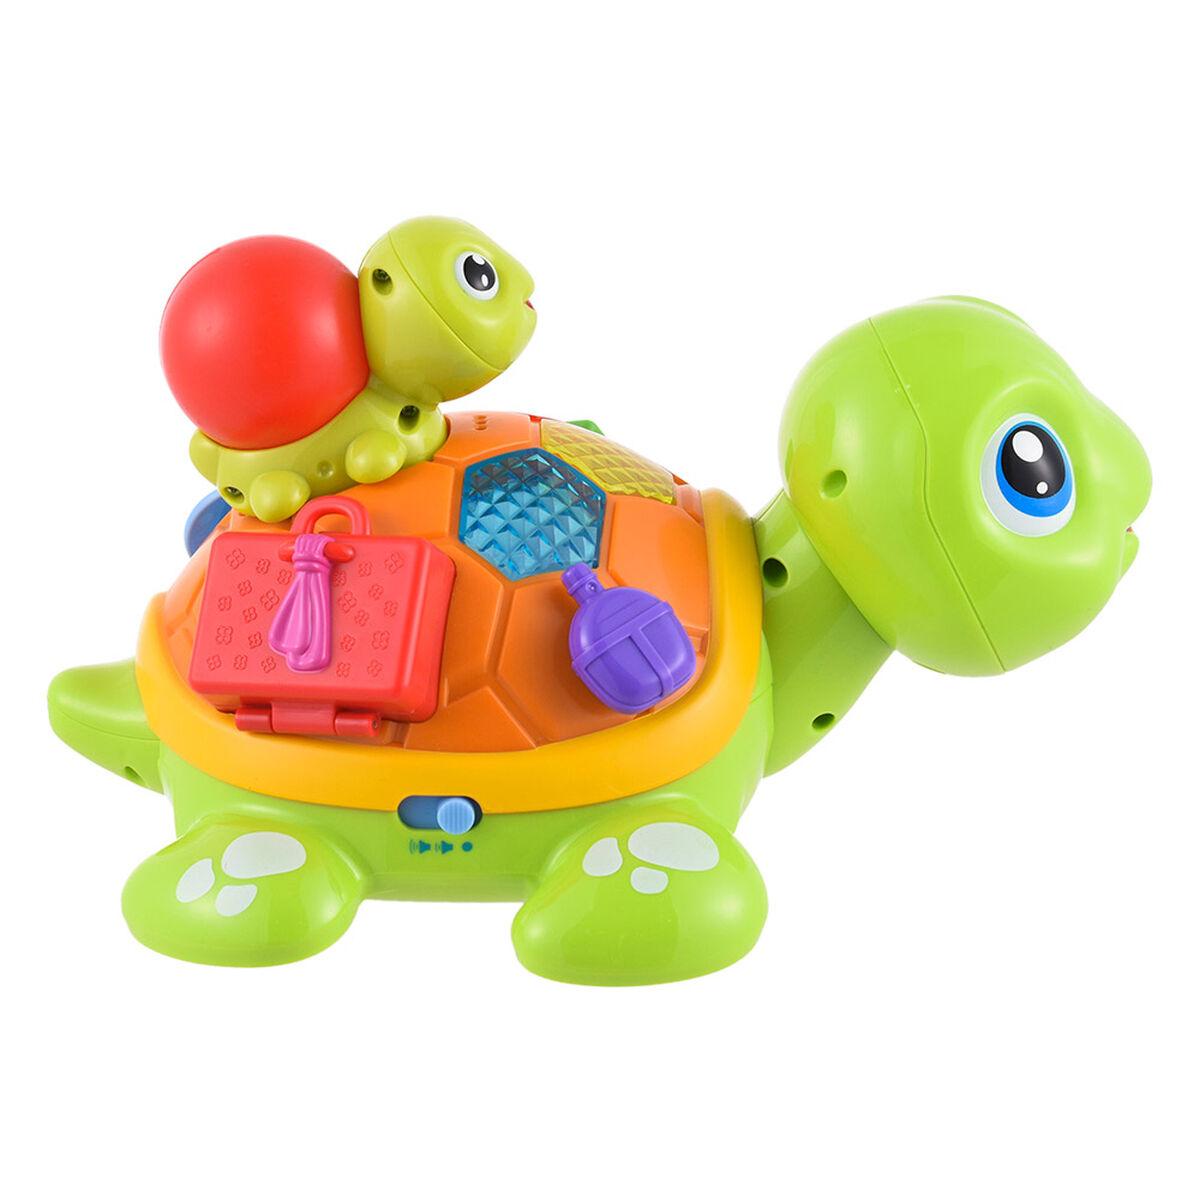 Tortuga Interactiva Baby Way BW Jp04